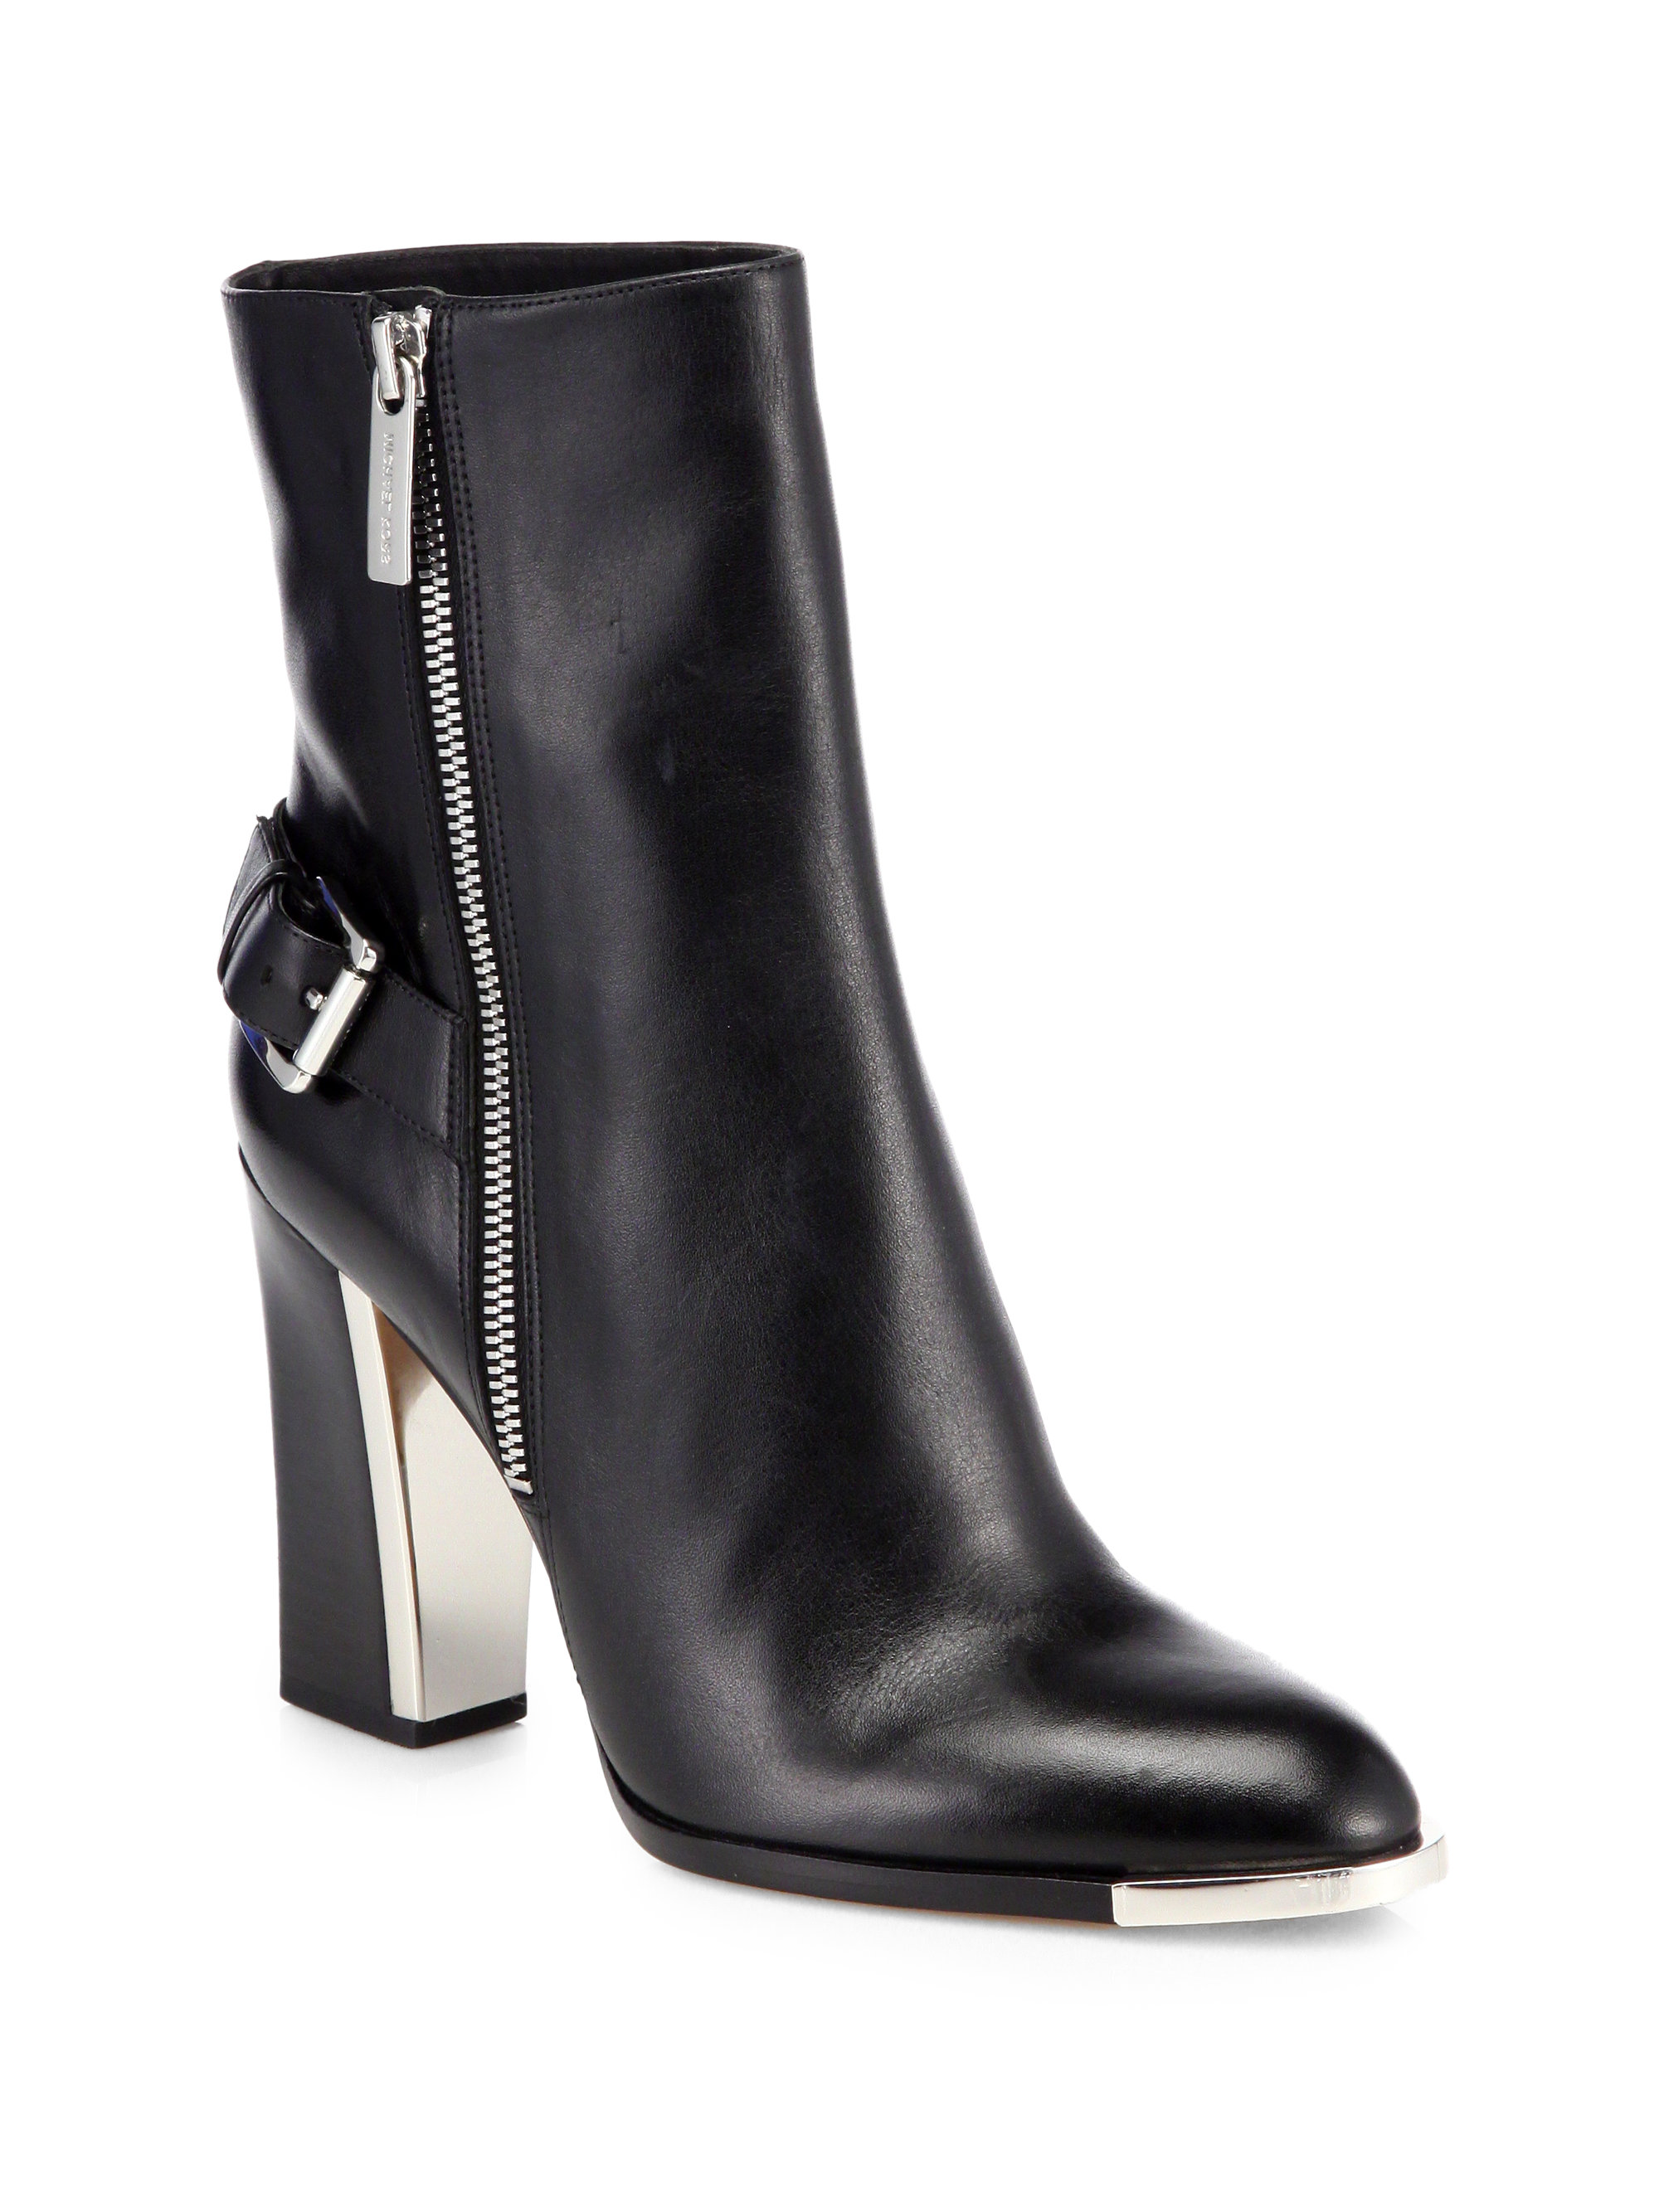 michael kors janell leather ankle boots in black lyst. Black Bedroom Furniture Sets. Home Design Ideas